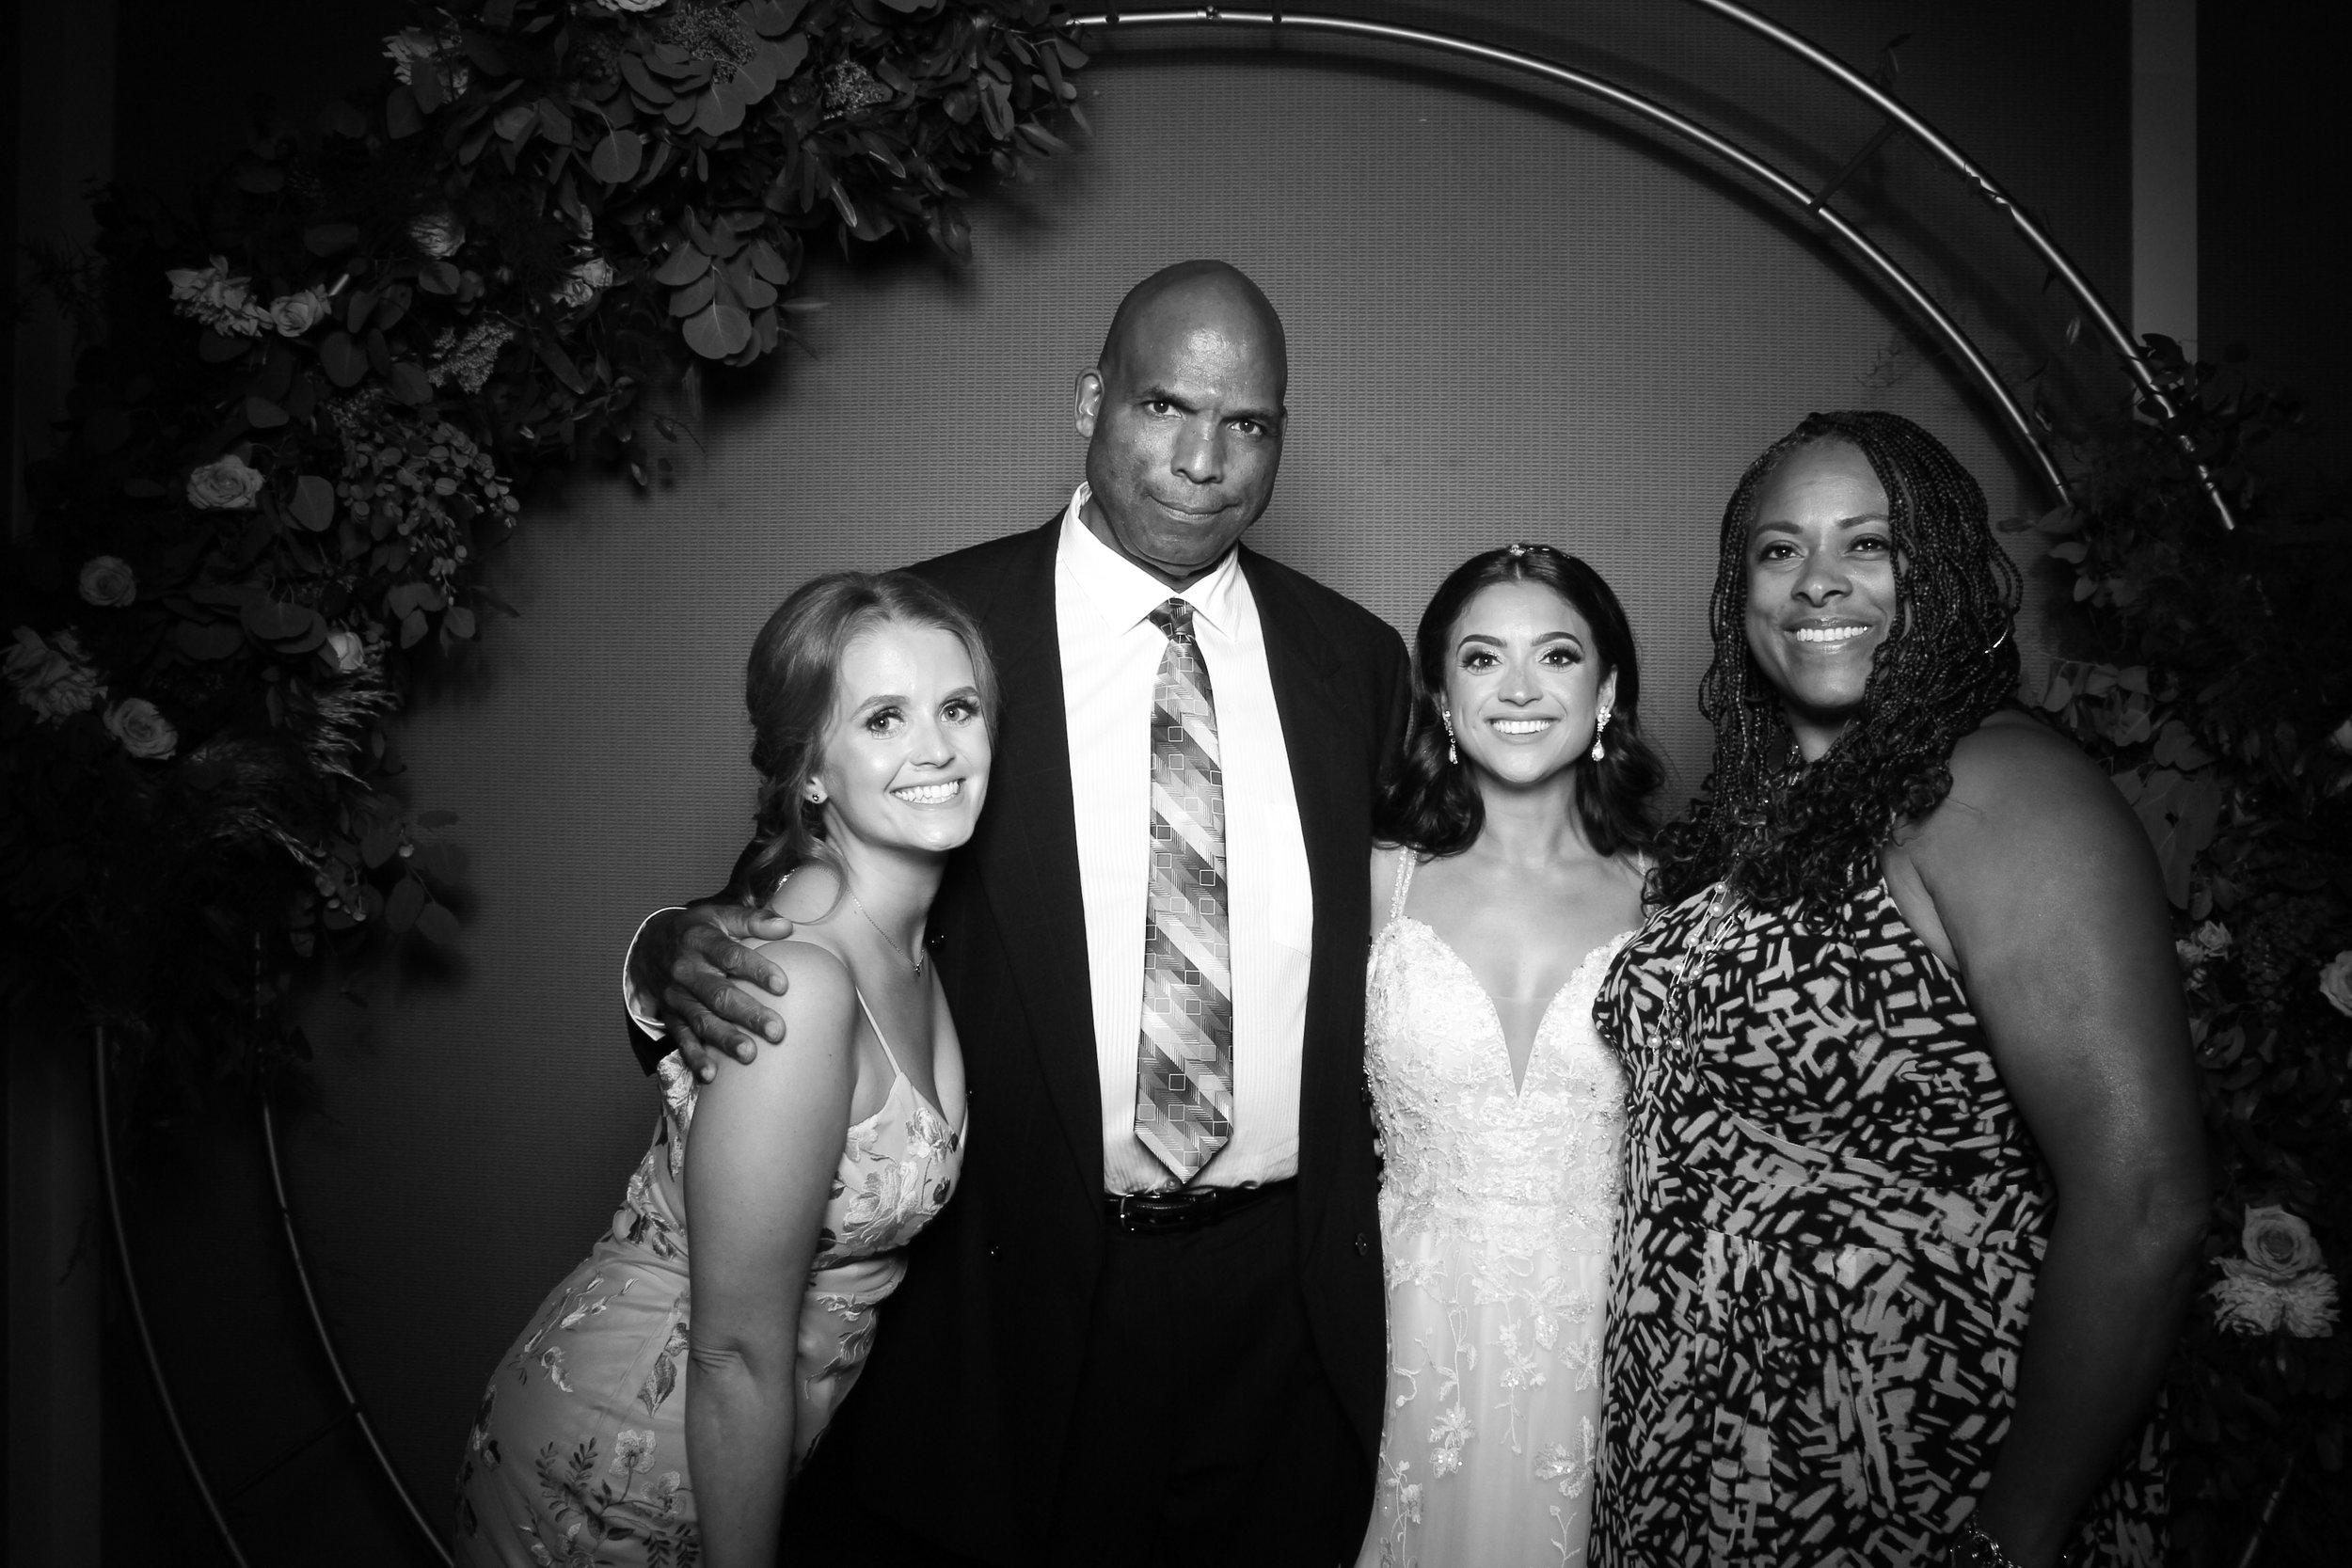 Metropolis_Ballroom_Wedding_Arlington_Heights_Photo_Booth_18.jpg